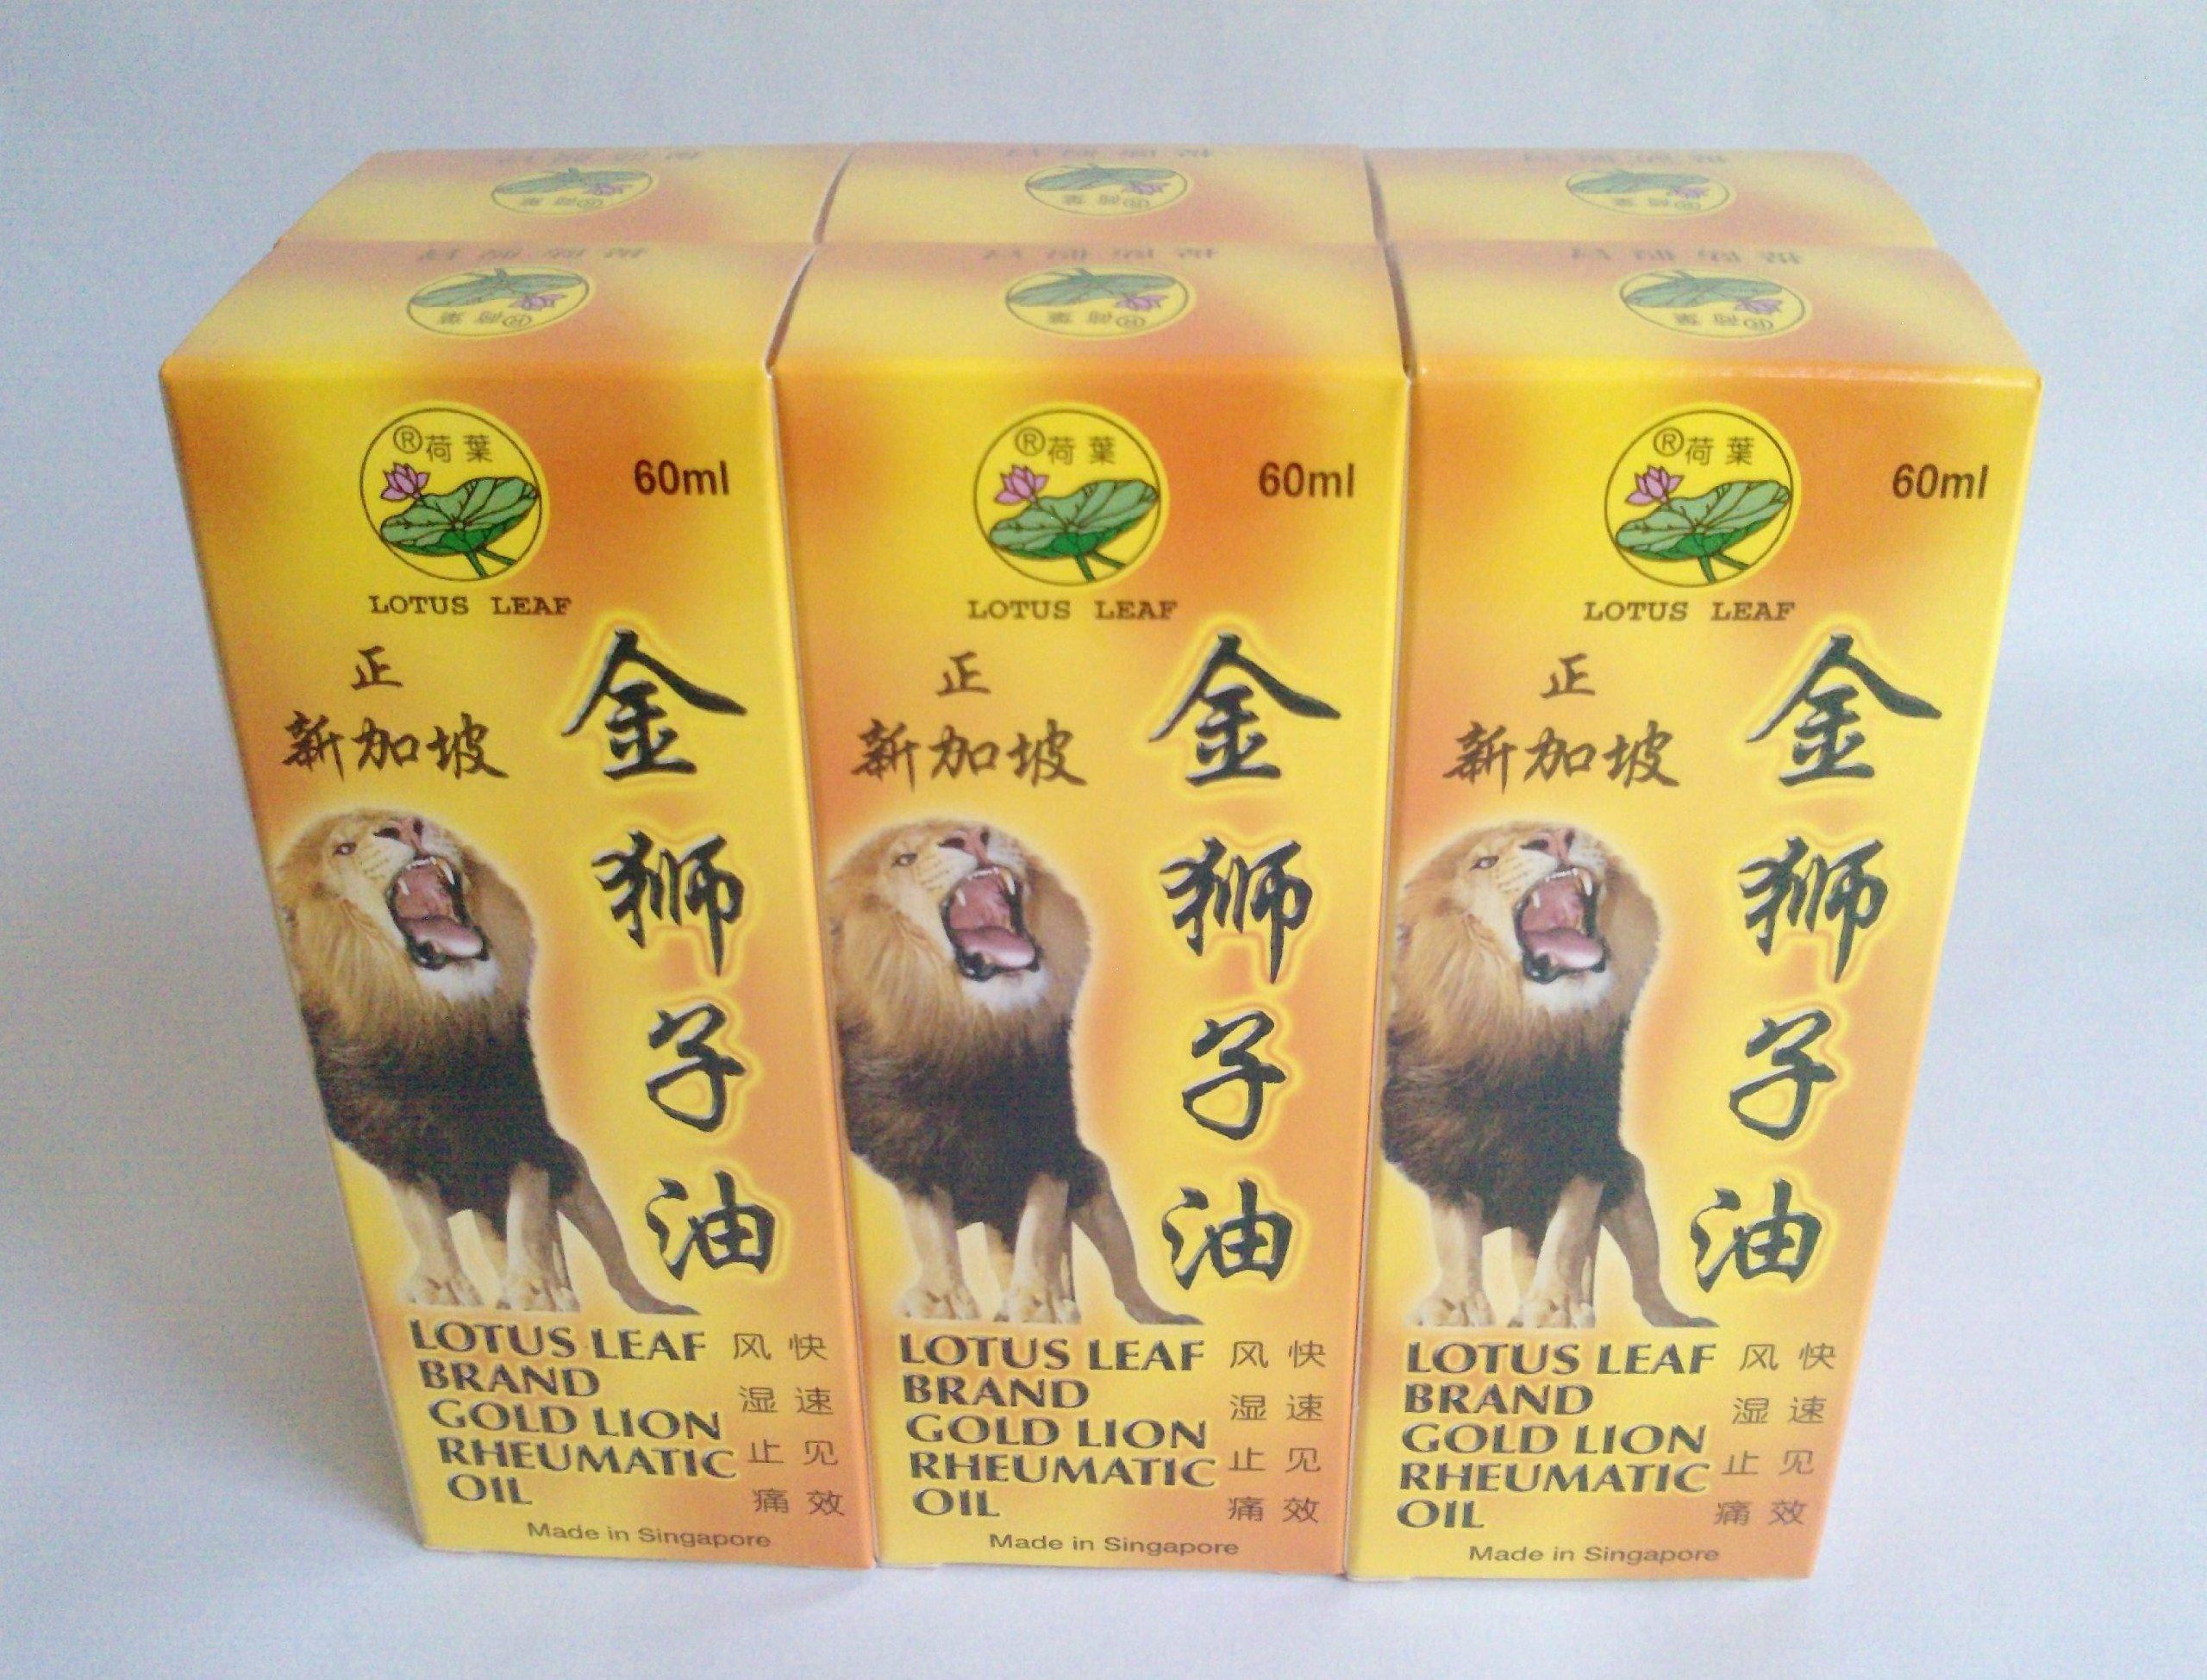 6 Packs - Lotus Leaf Brand Gold Lion Rheumatic Oil 荷叶牌正新加坡金狮子油 (六瓶装) Dầu Sư Tử 荷叶牌 正新加坡 金狮子油